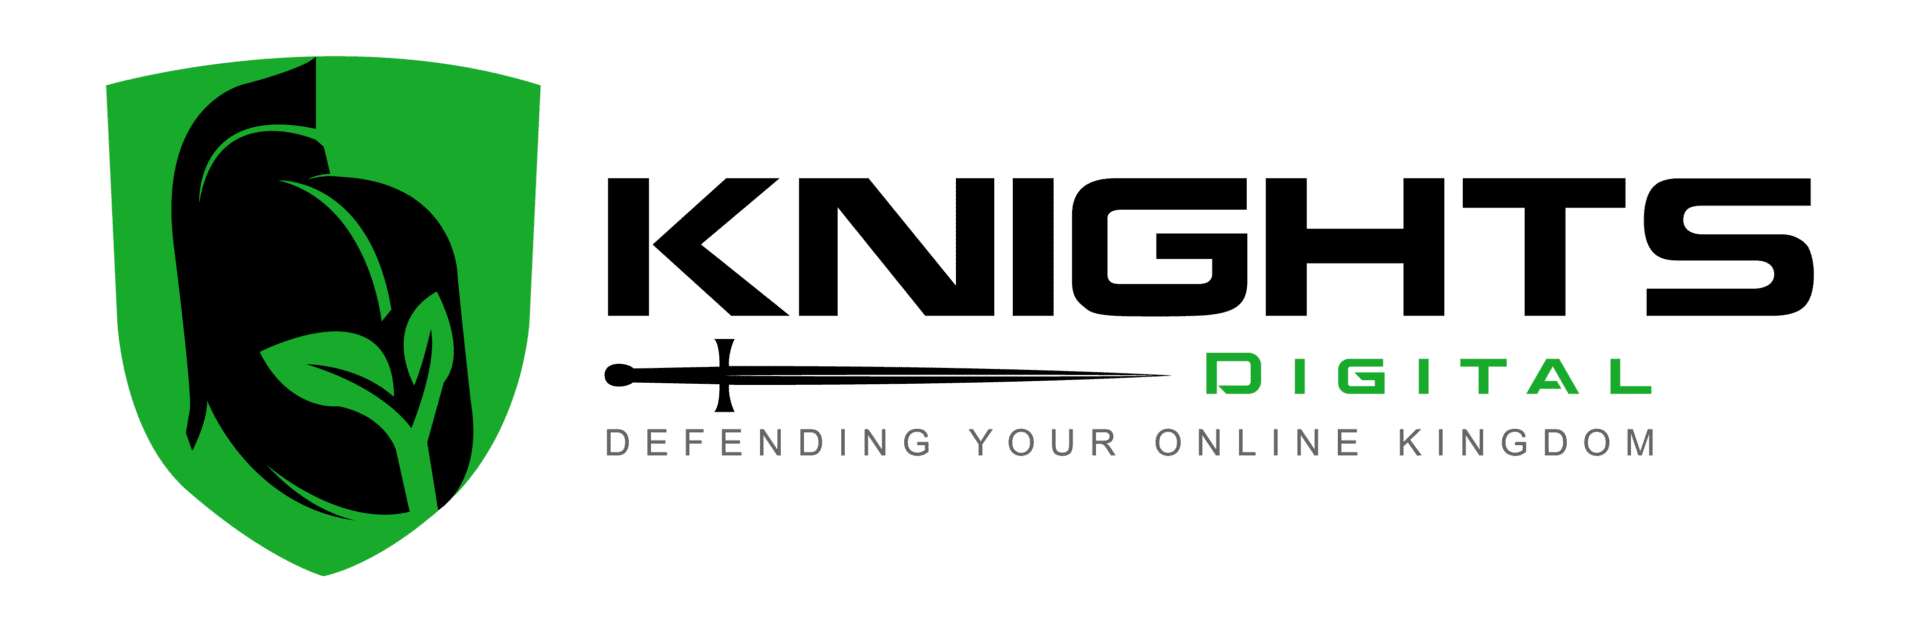 Knights Digital